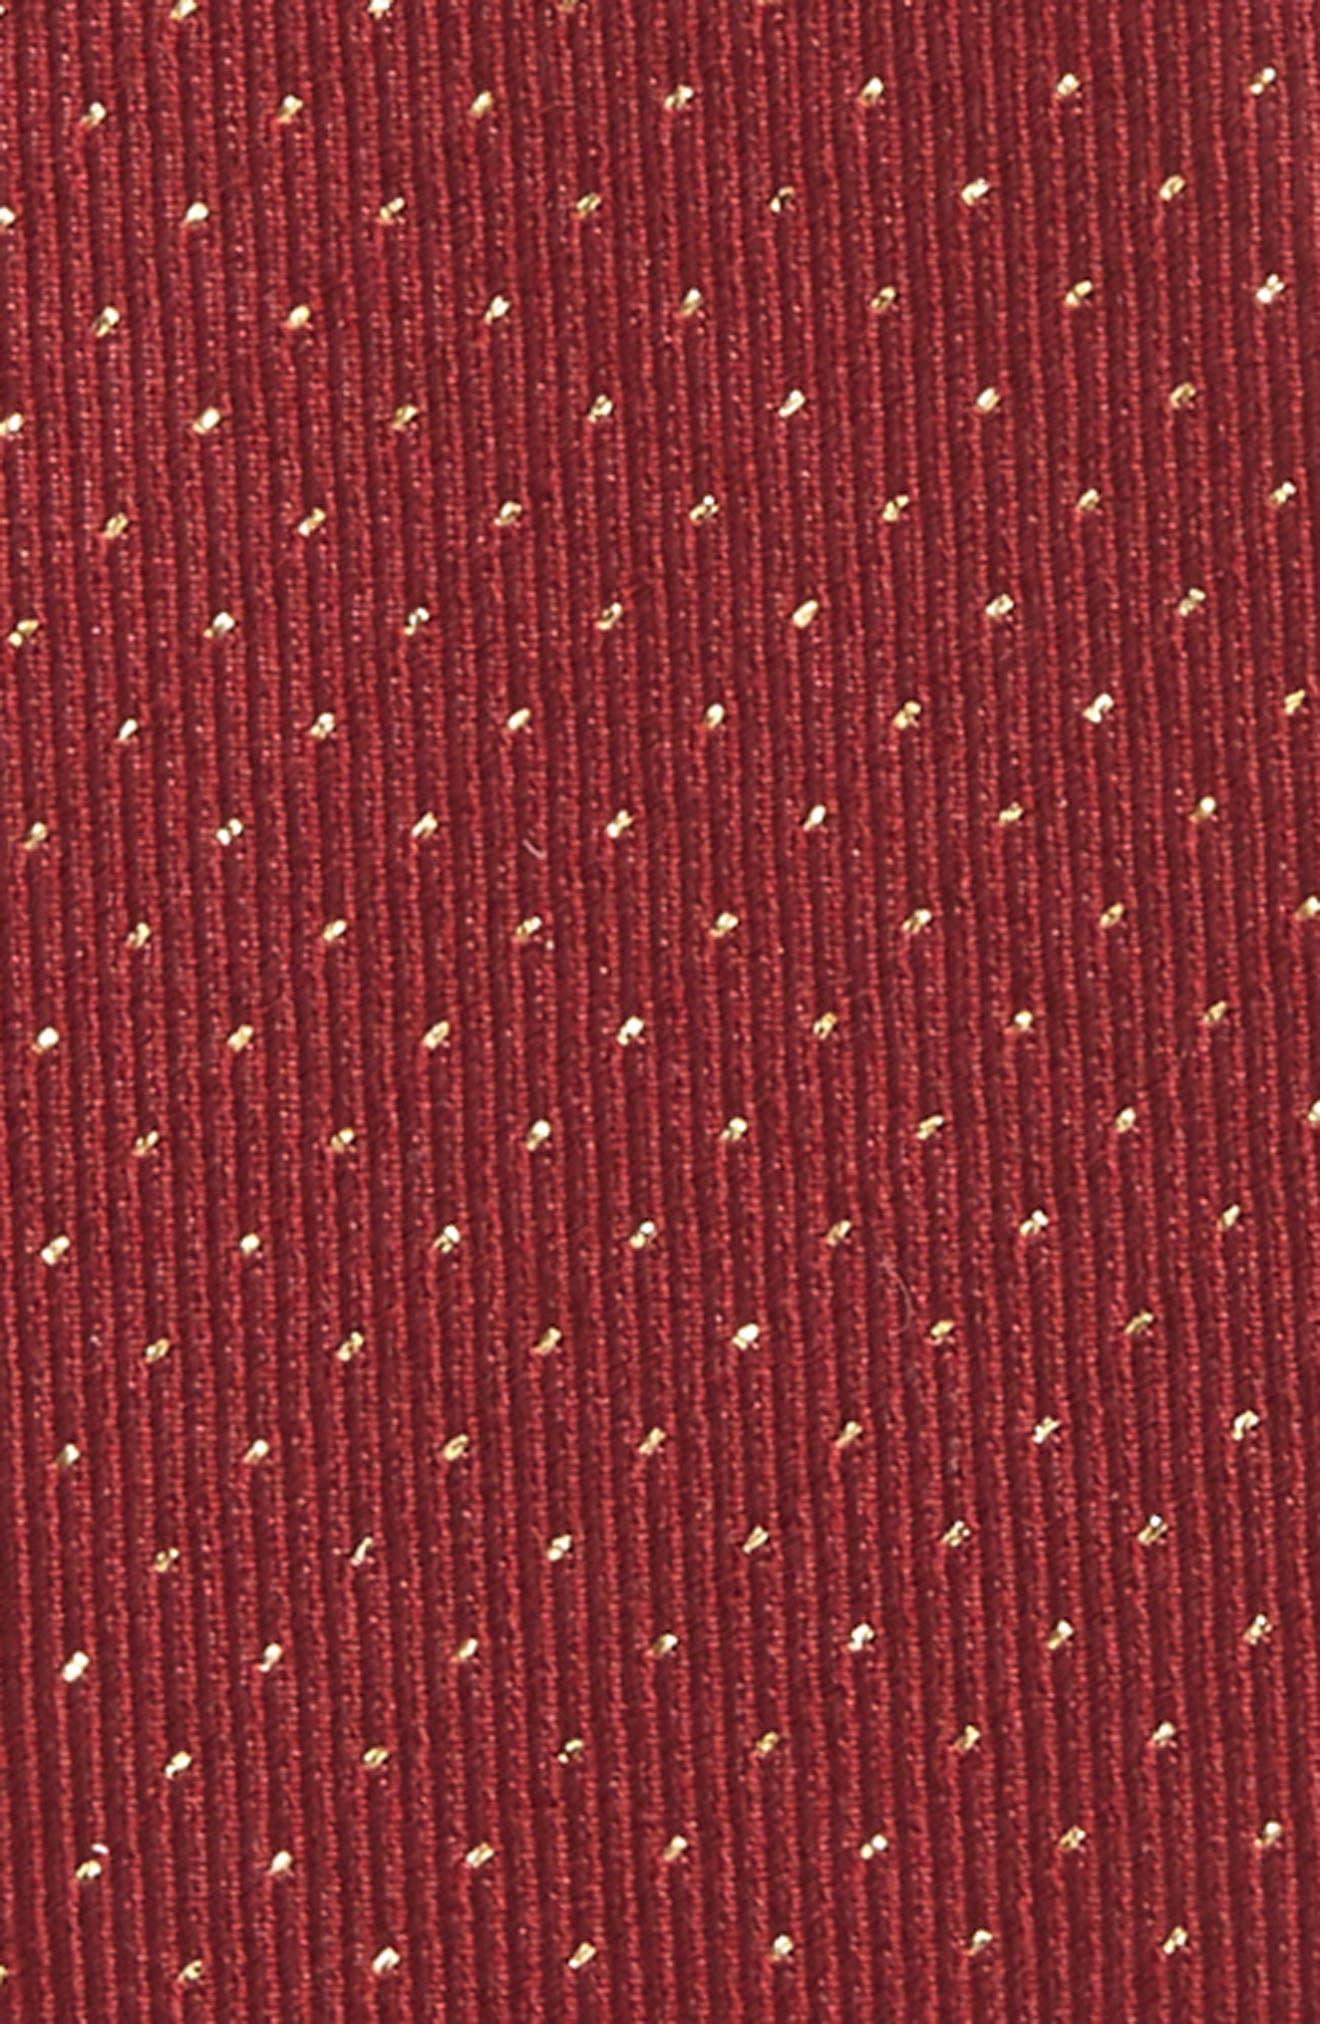 Flicker Self Bow Tie,                             Alternate thumbnail 3, color,                             Burgundy